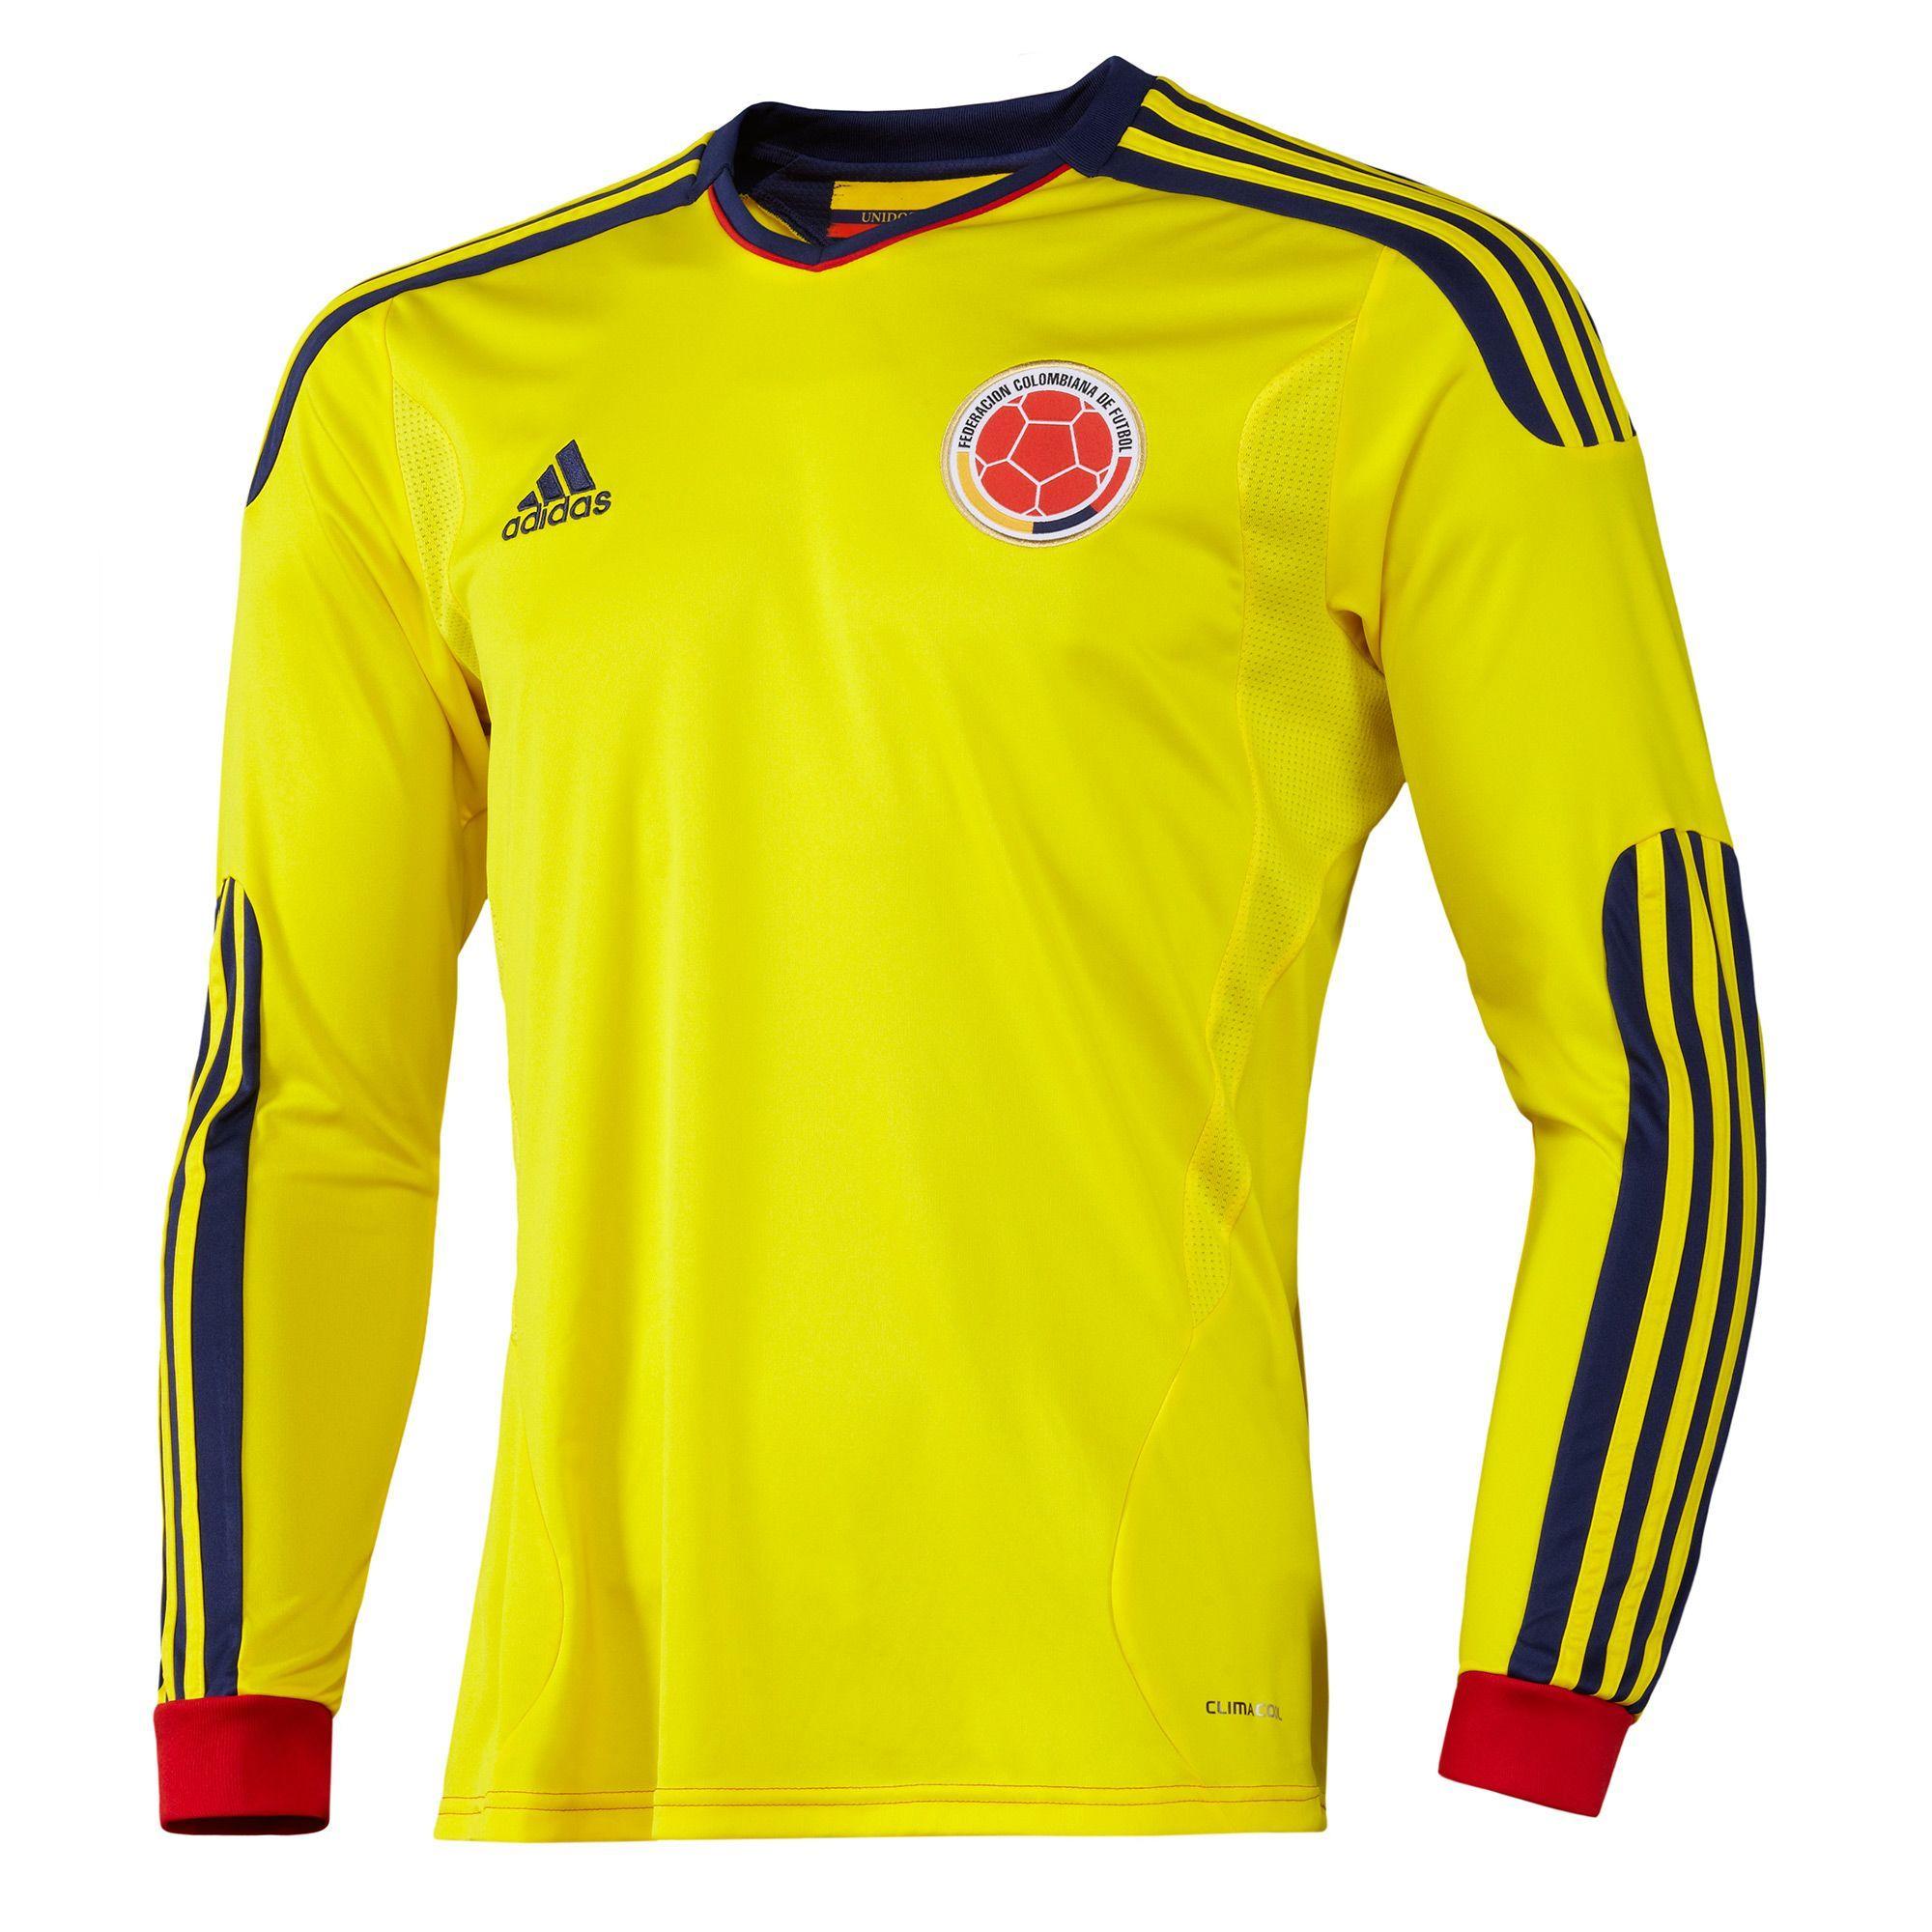 adidas - Camiseta Local de Manga Larga de la Selección Colombia FCF ... de14515199d19